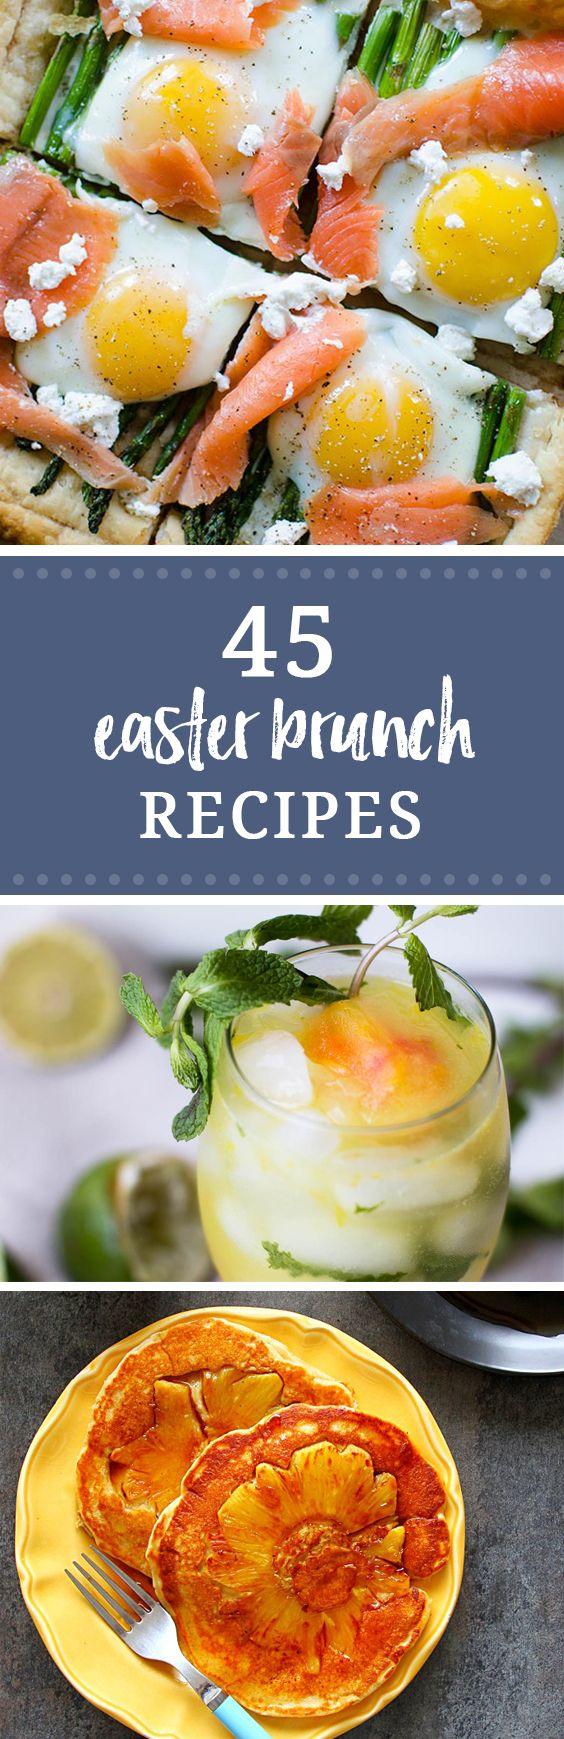 351 best easter ideas images on pinterest easter recipes for Easter brunch restaurant menus